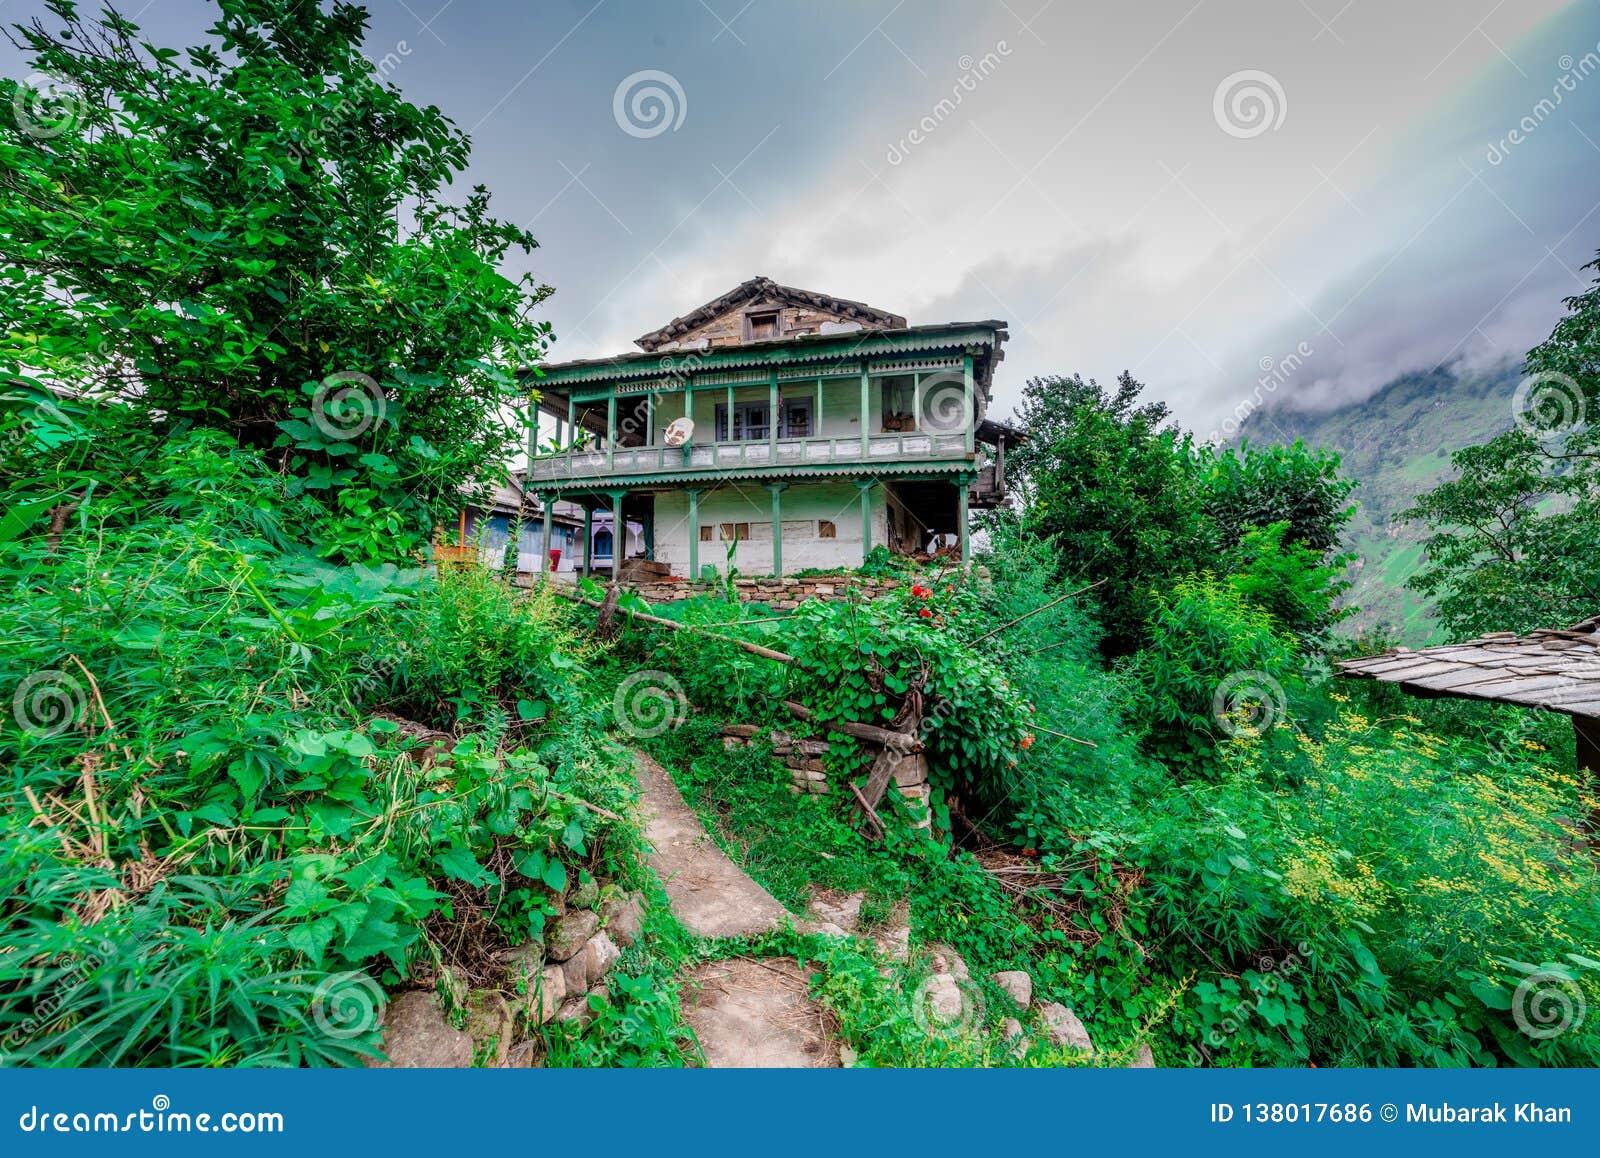 A traditional house in himalayas, sainj valley, kullu, himachal pradesh, india